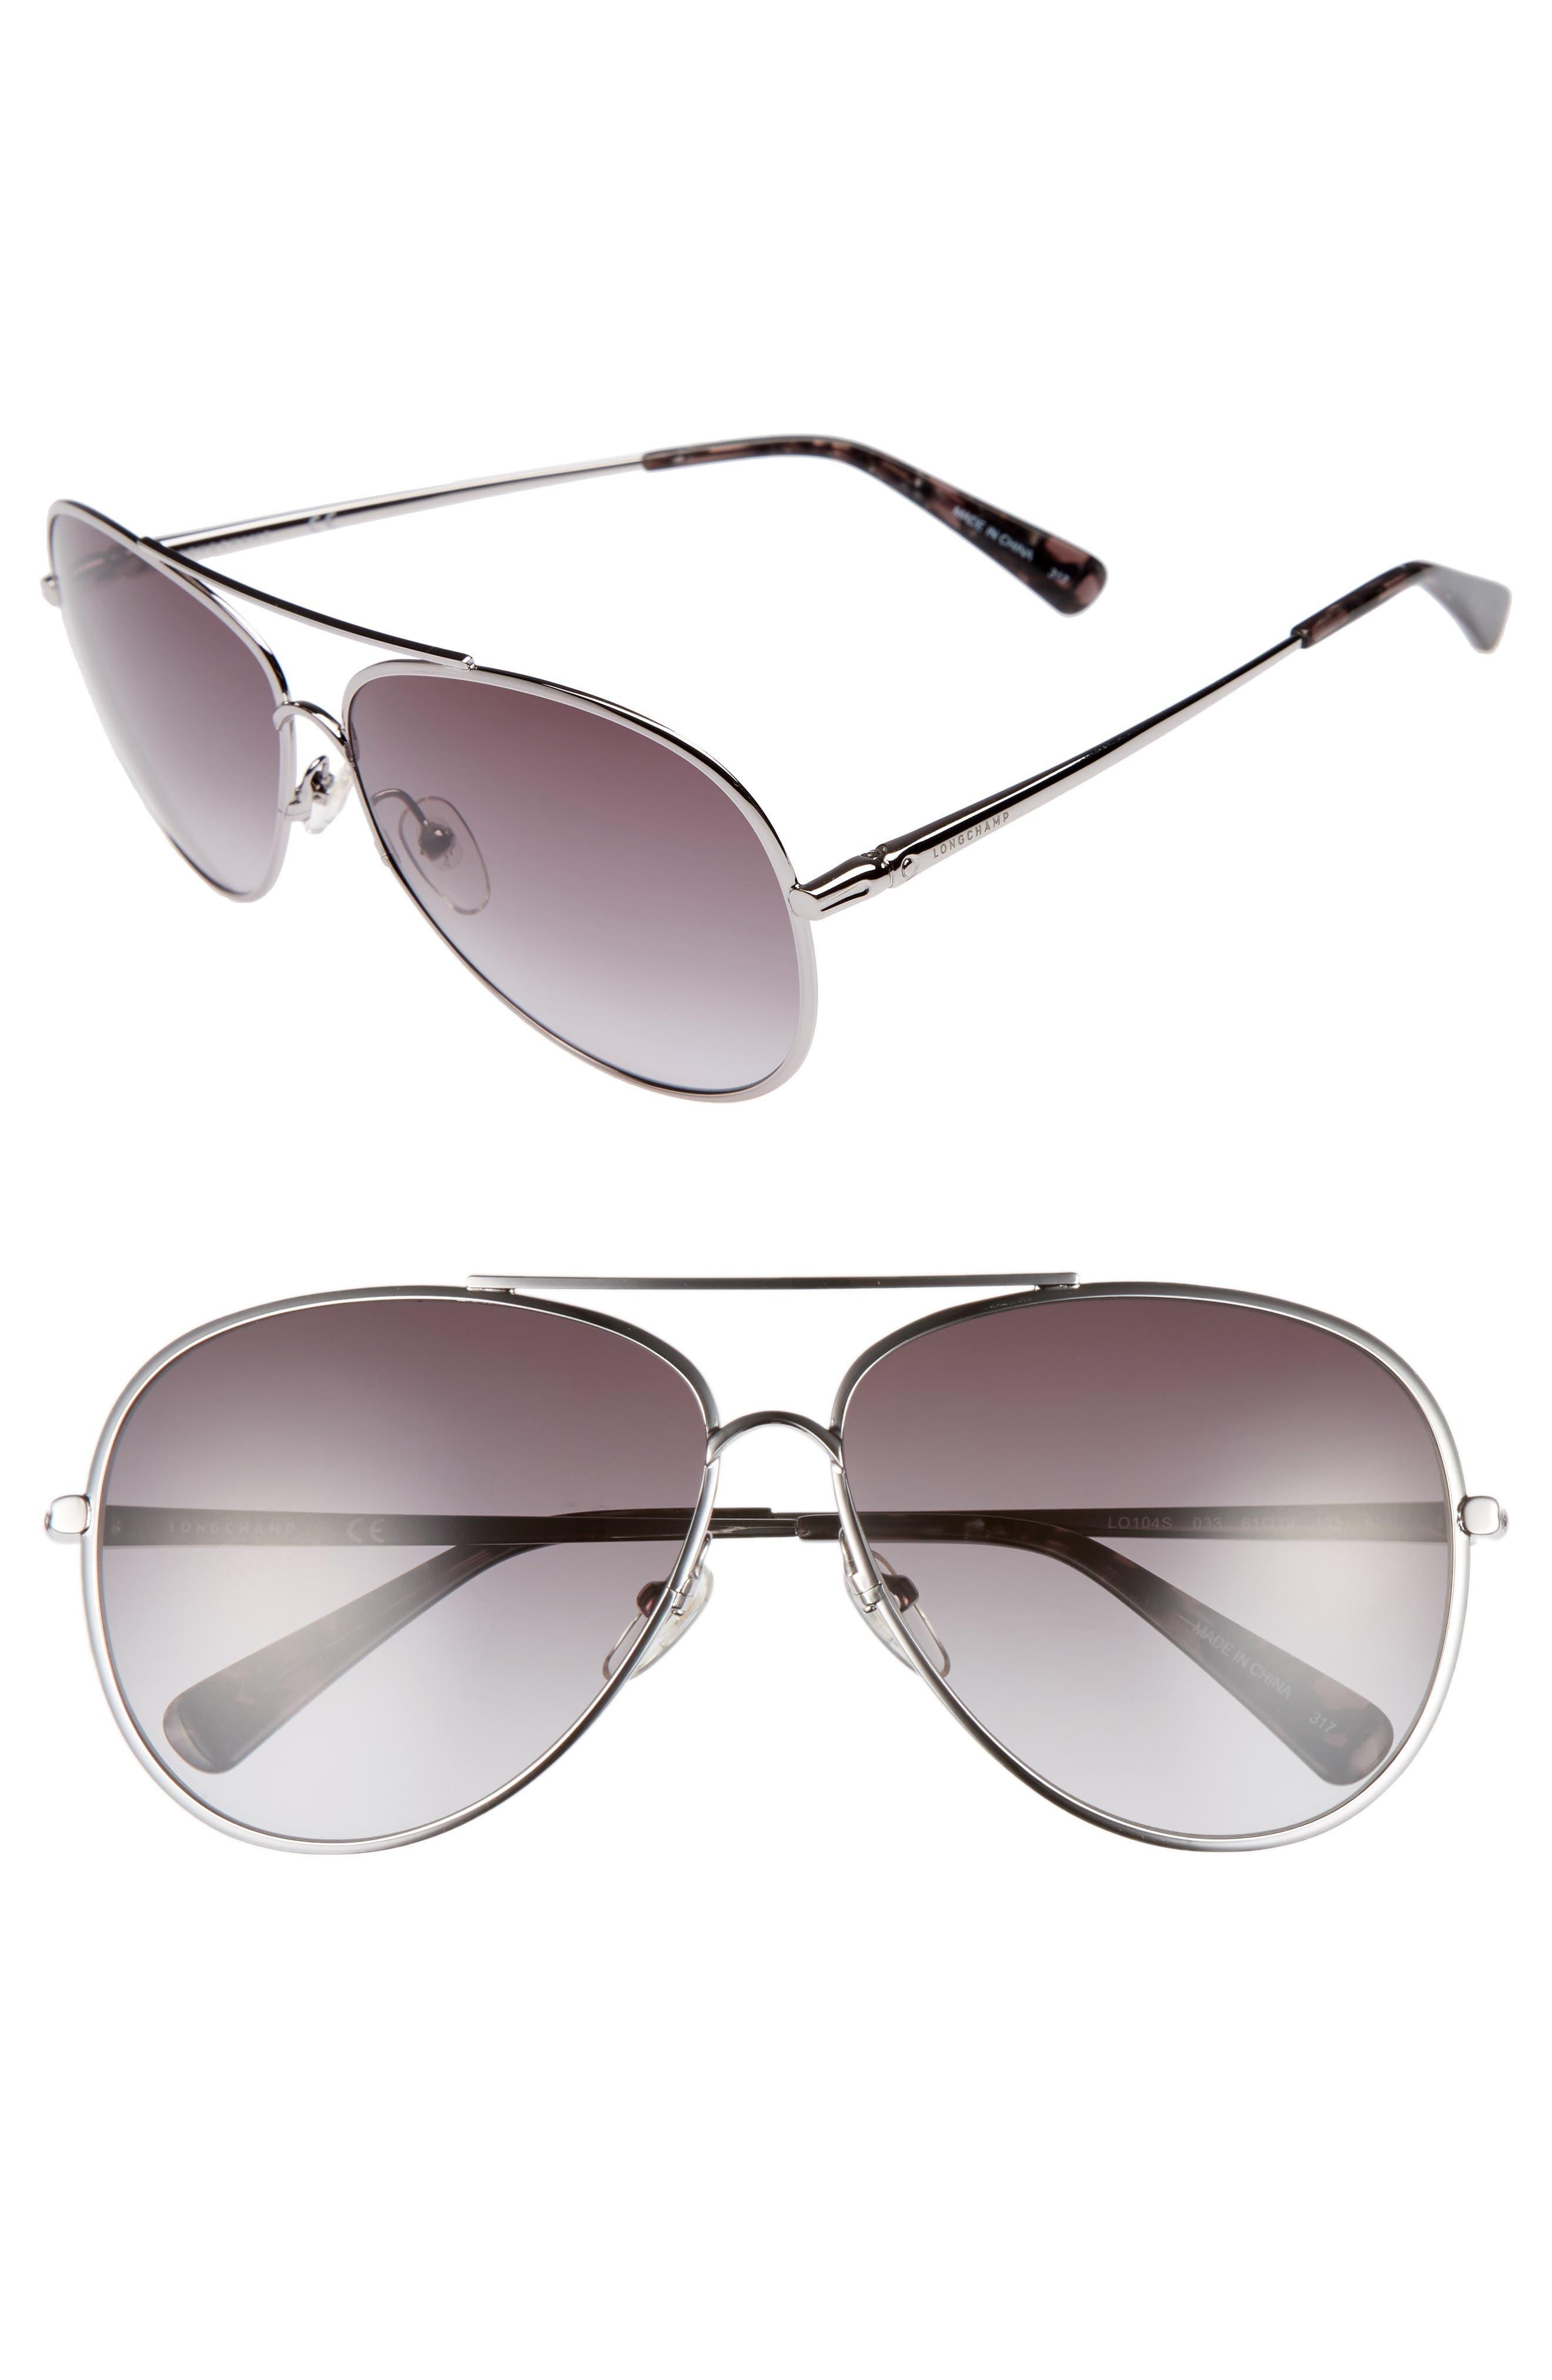 61mm Gradient Lens Aviator Sunglasses,                             Main thumbnail 1, color,                             033